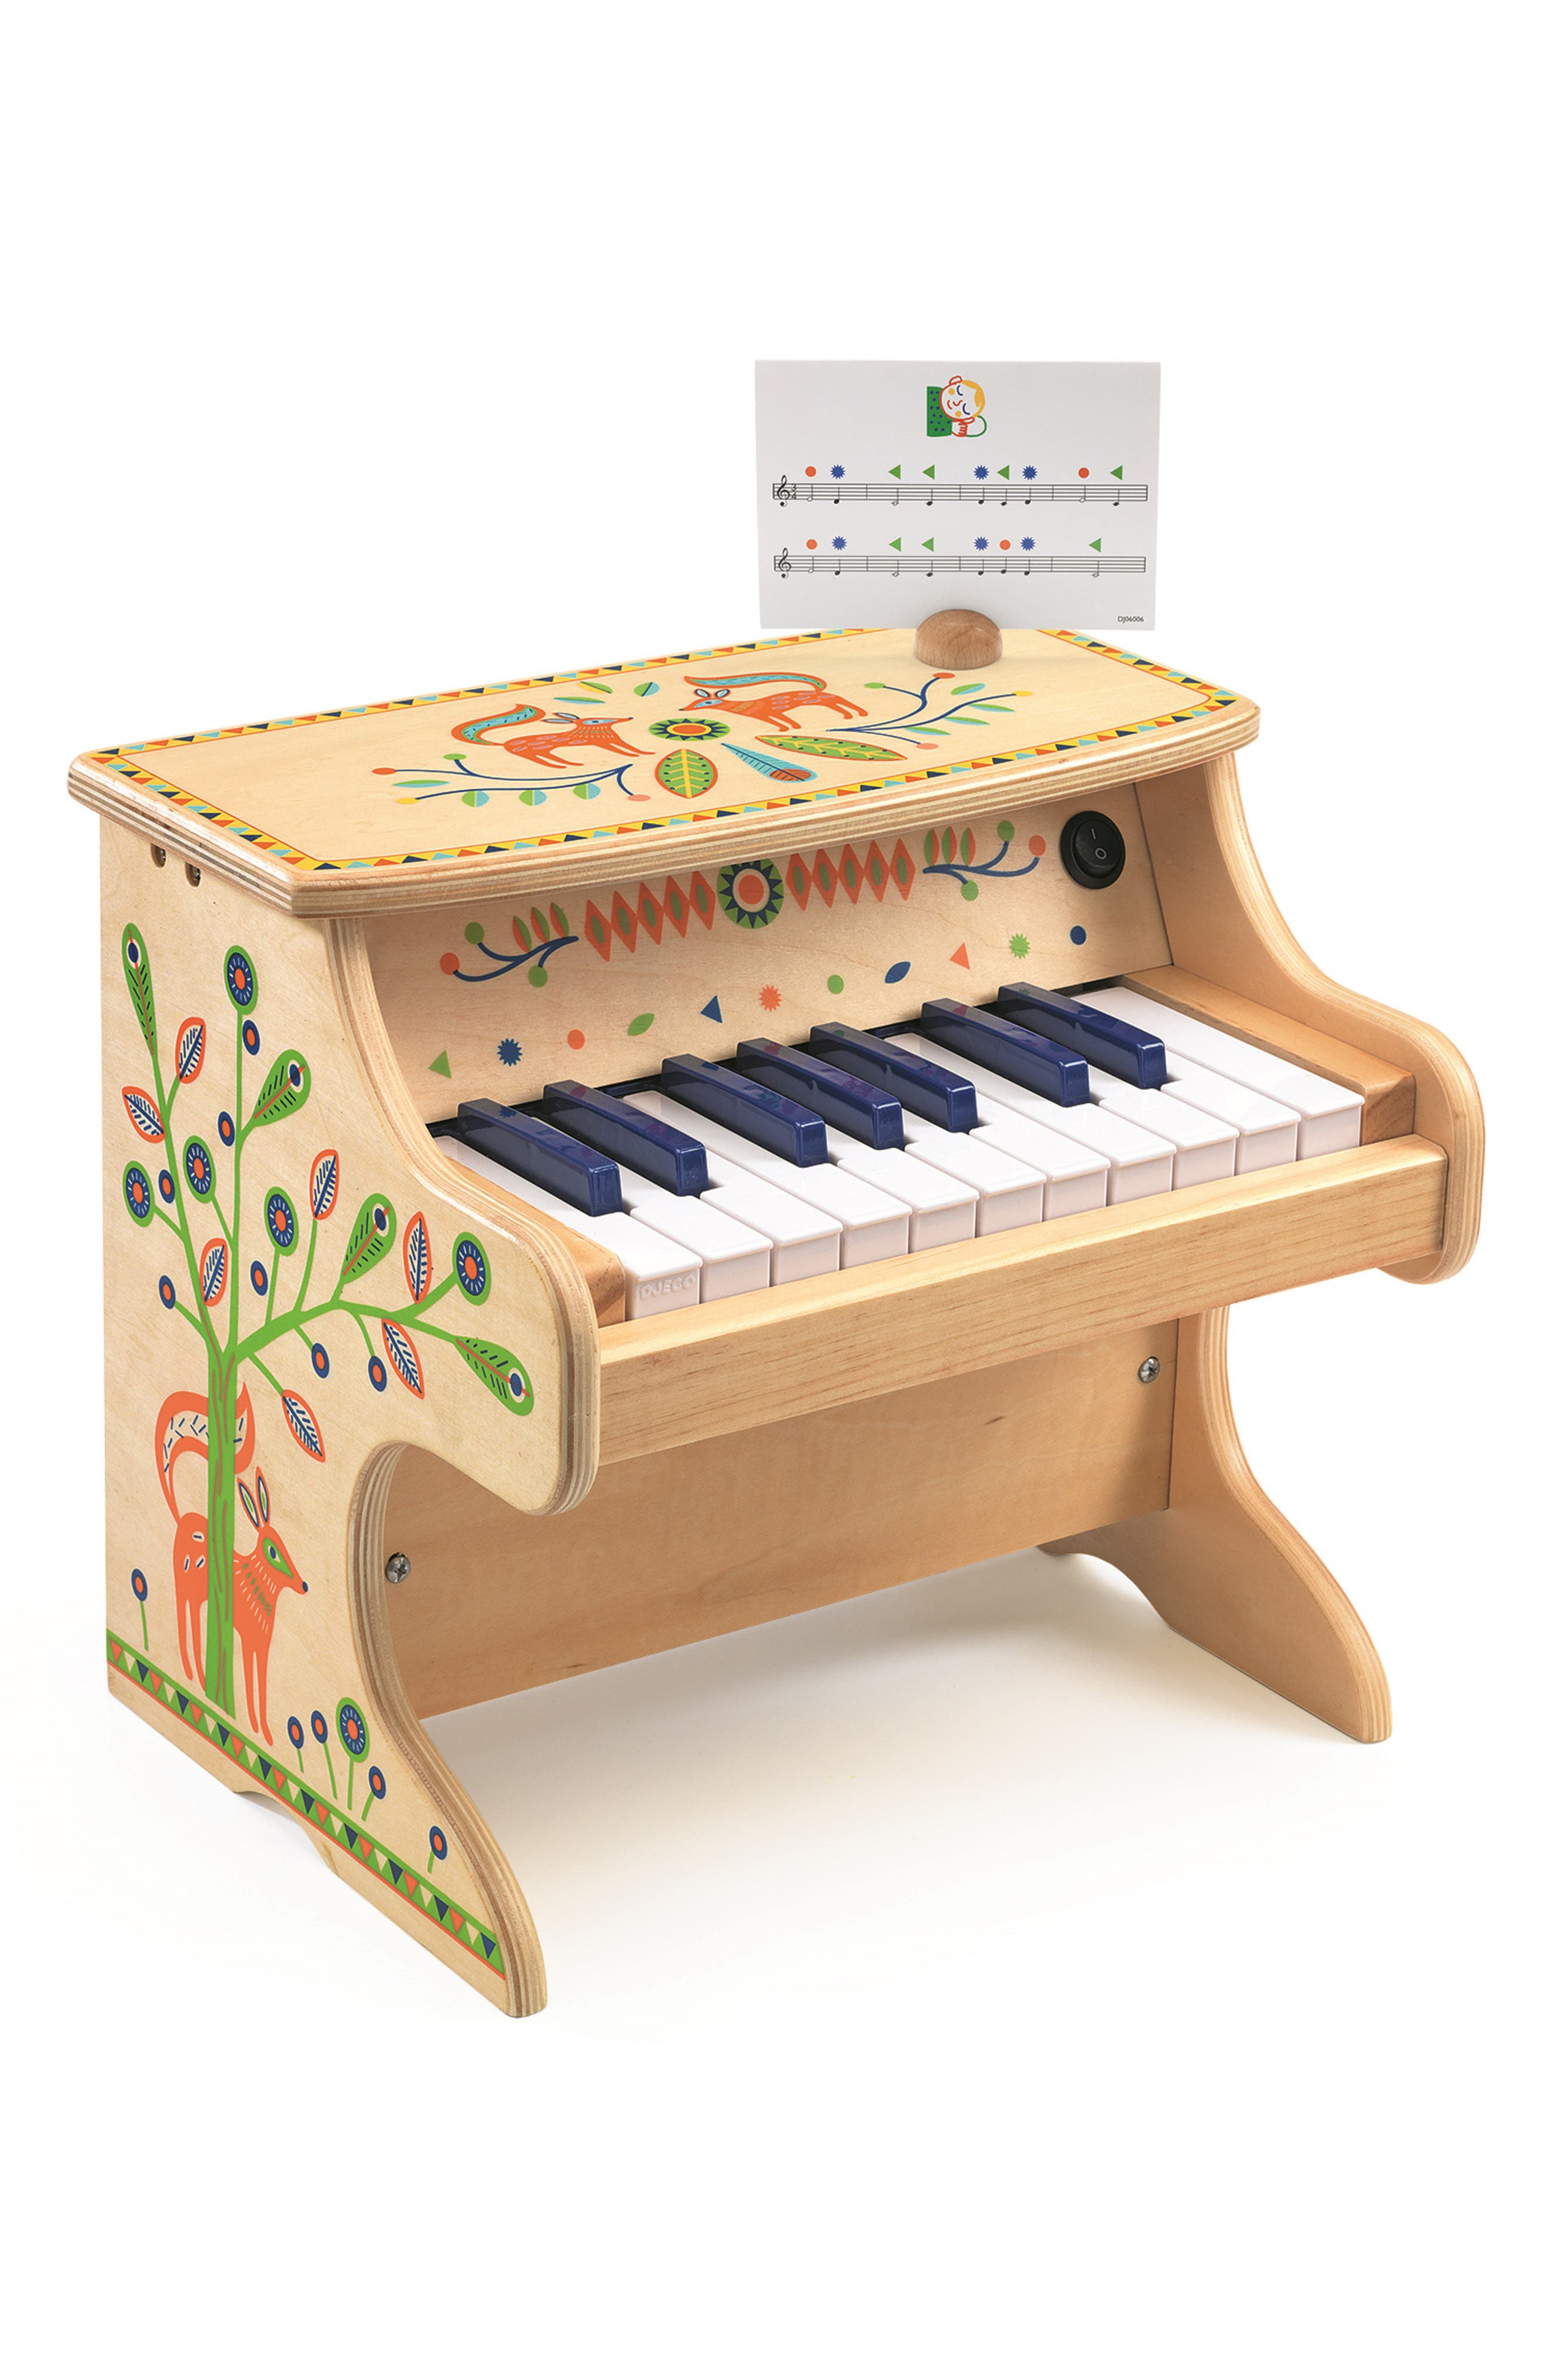 Toddler Djeco Animambo Electronic Toy Piano